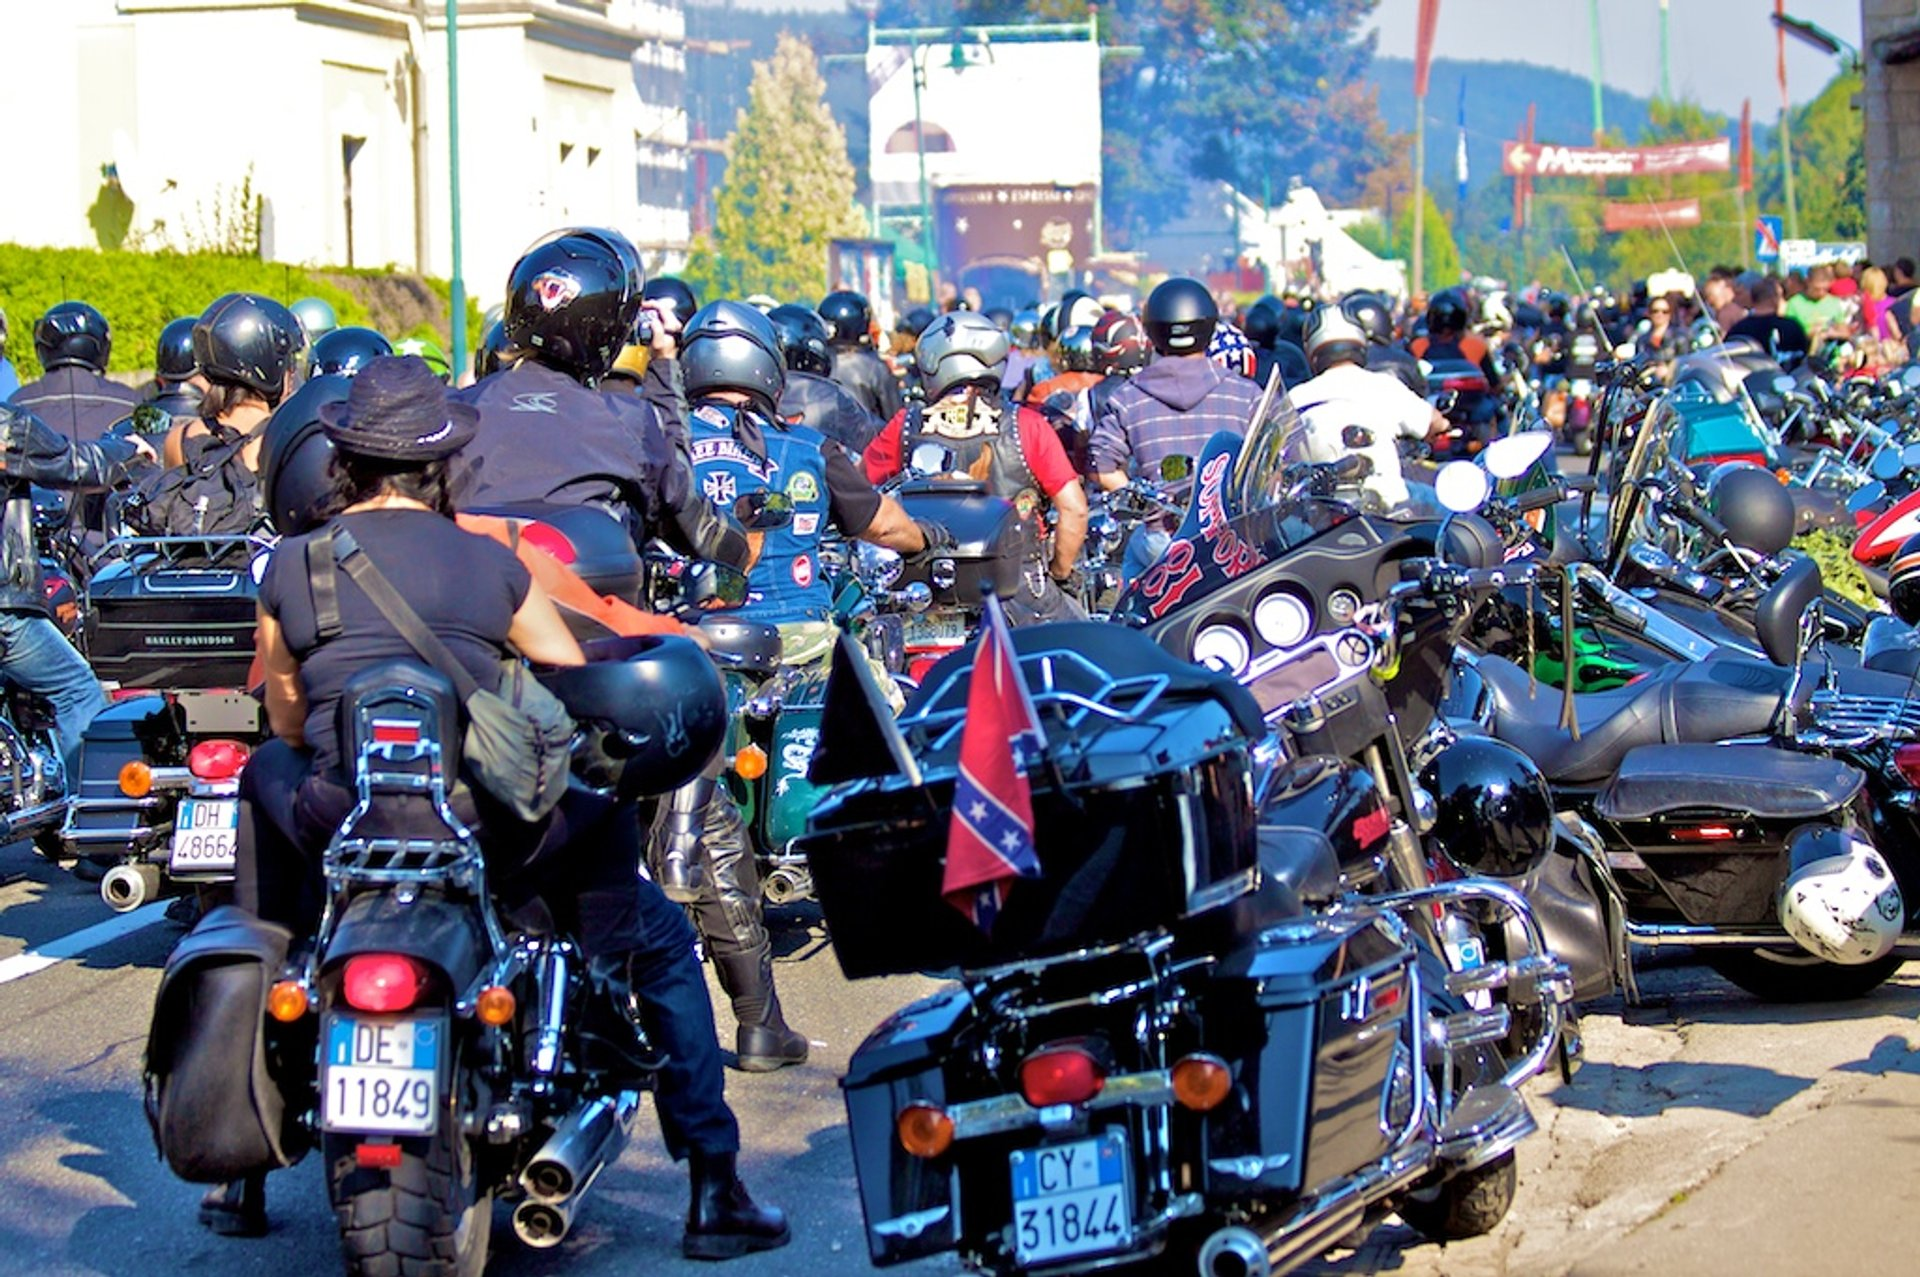 European Bike Week in Austria - Best Season 2020